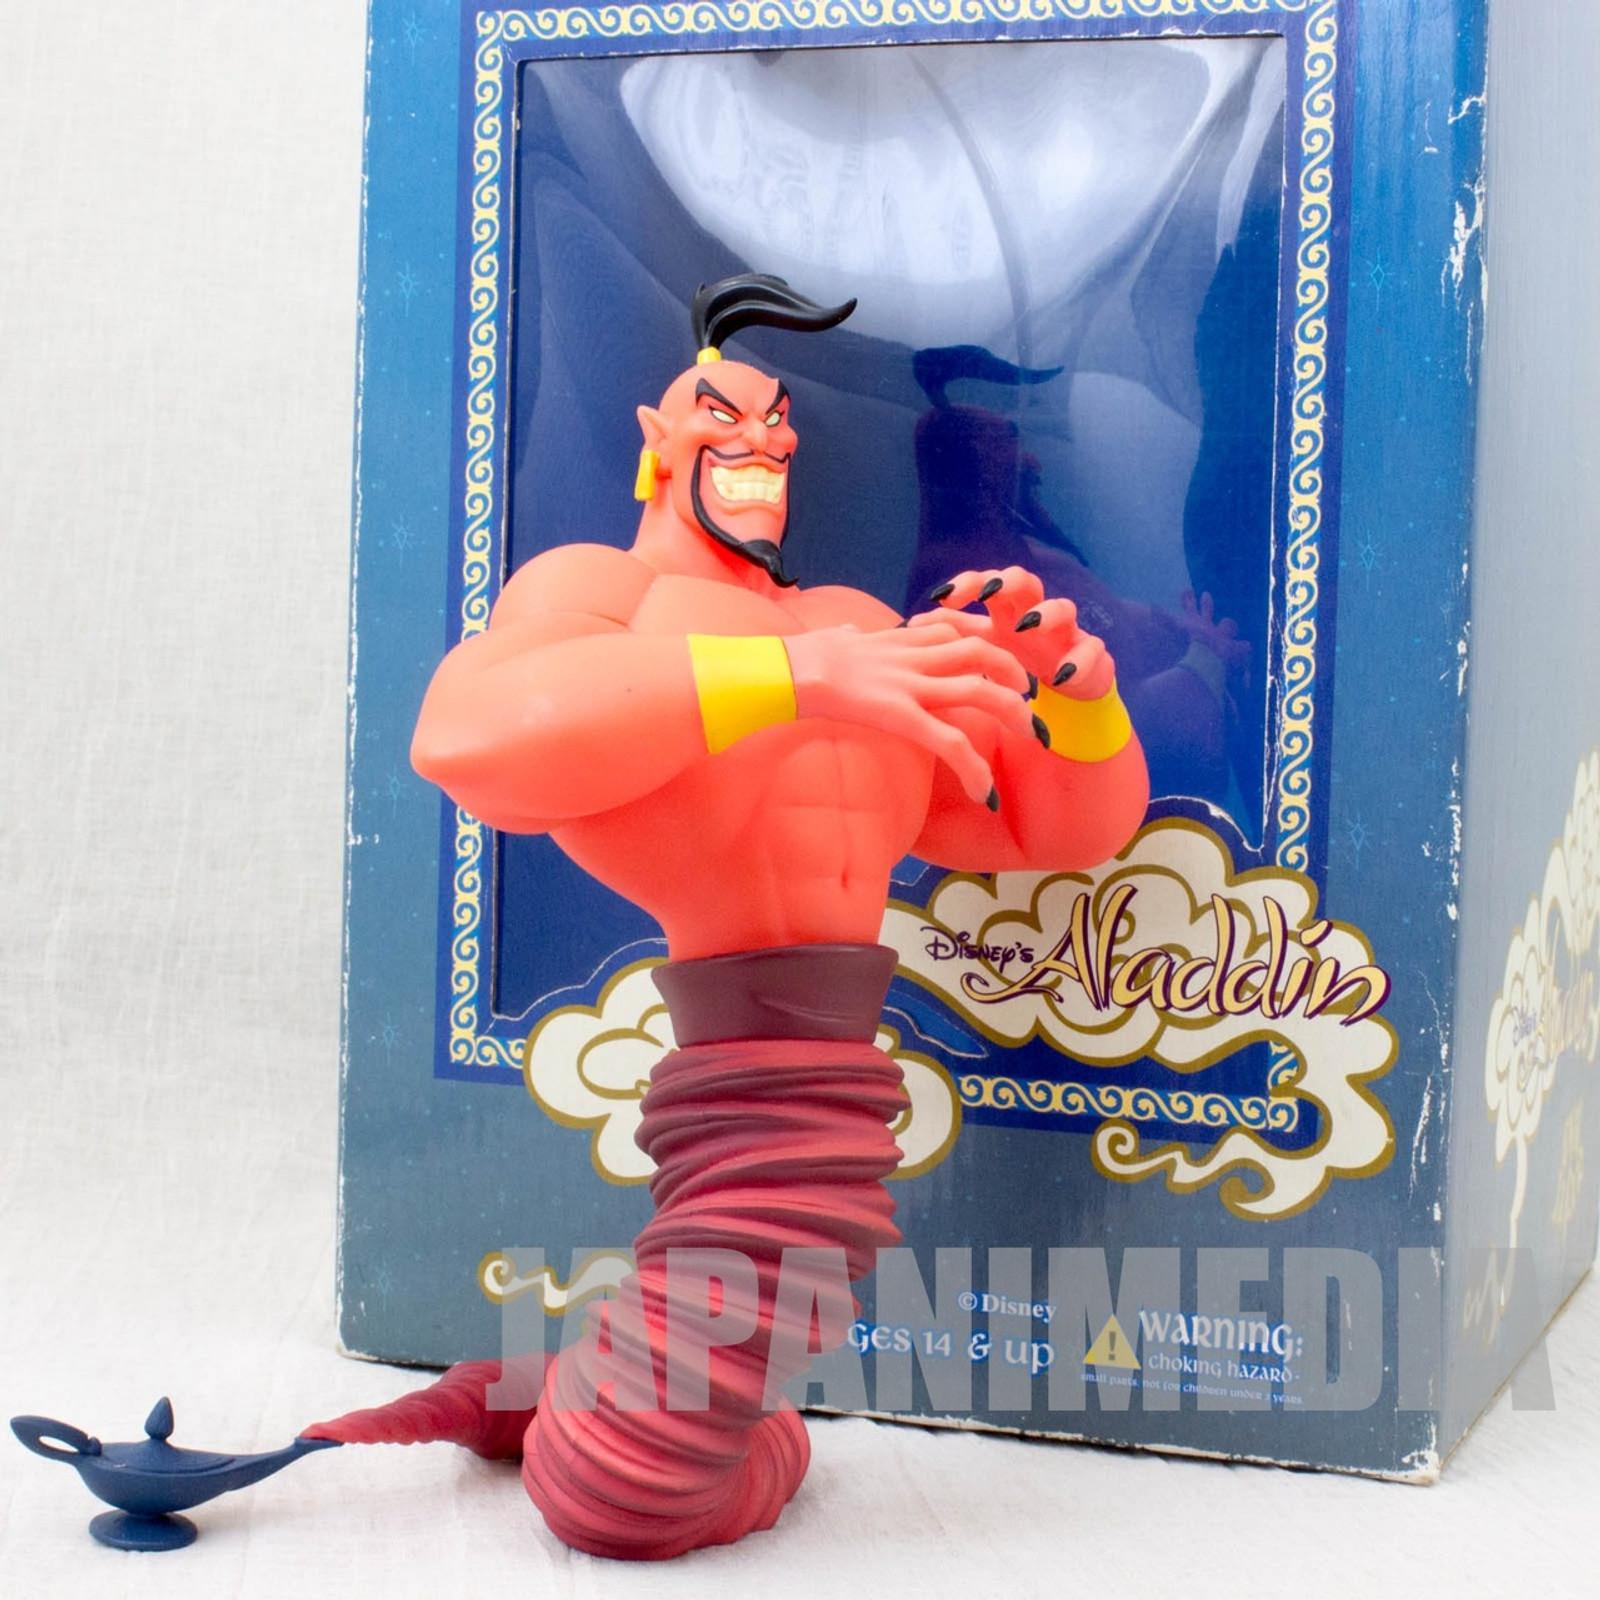 Disney Aladdin Evil Jafar Vinyl Collectible Dolls Figure VCD Medicom Toy JAPAN